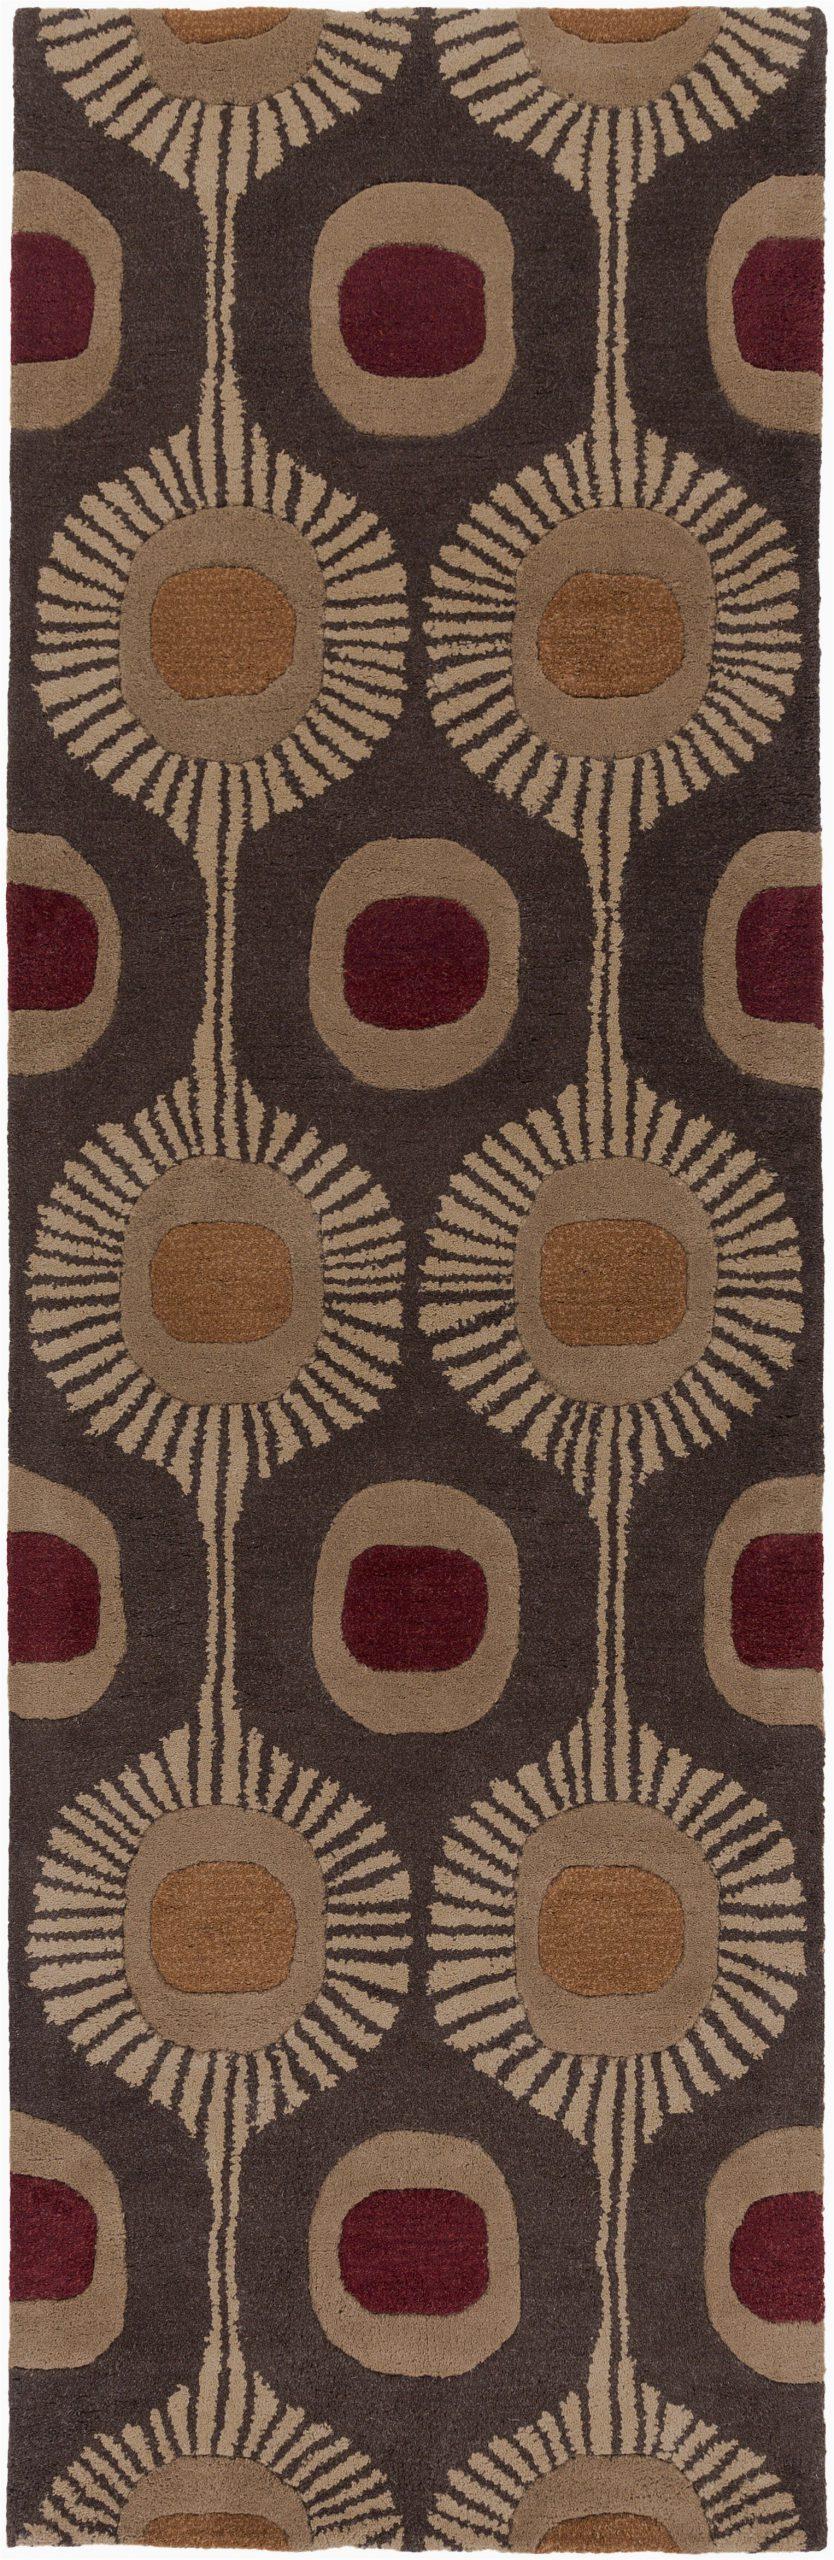 brown tan kitchen rugs c a1247 2361